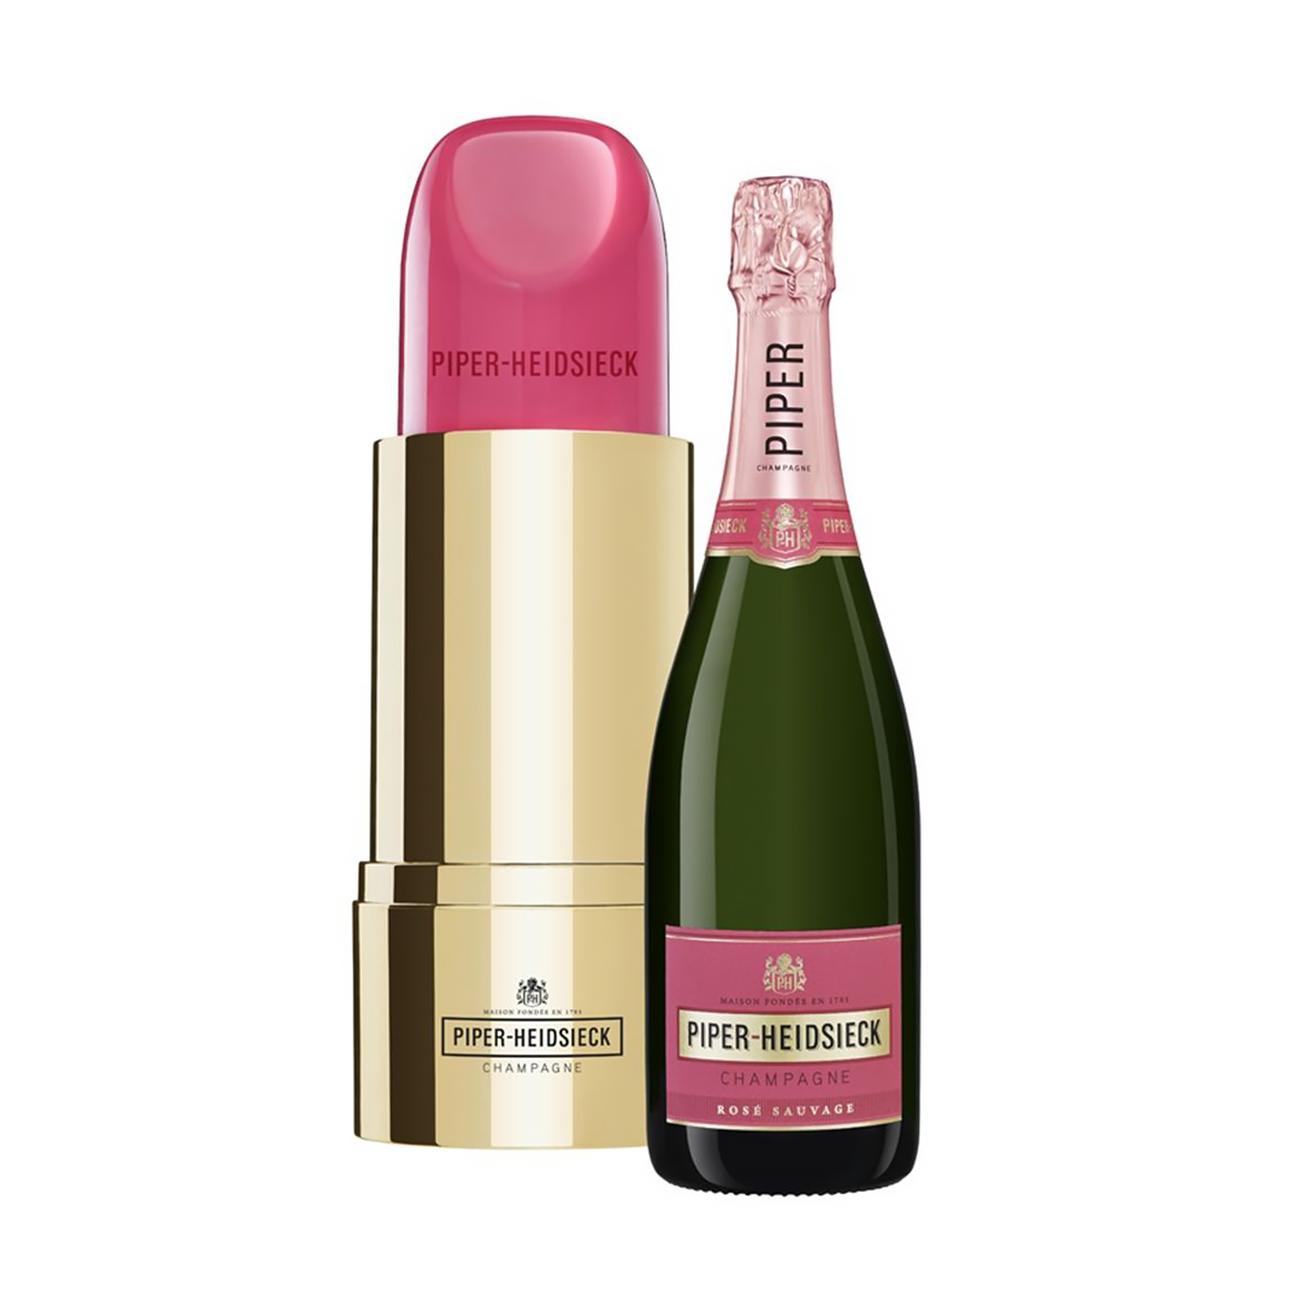 Rosé Sauvage 750ml de la Piper-Heidsieck